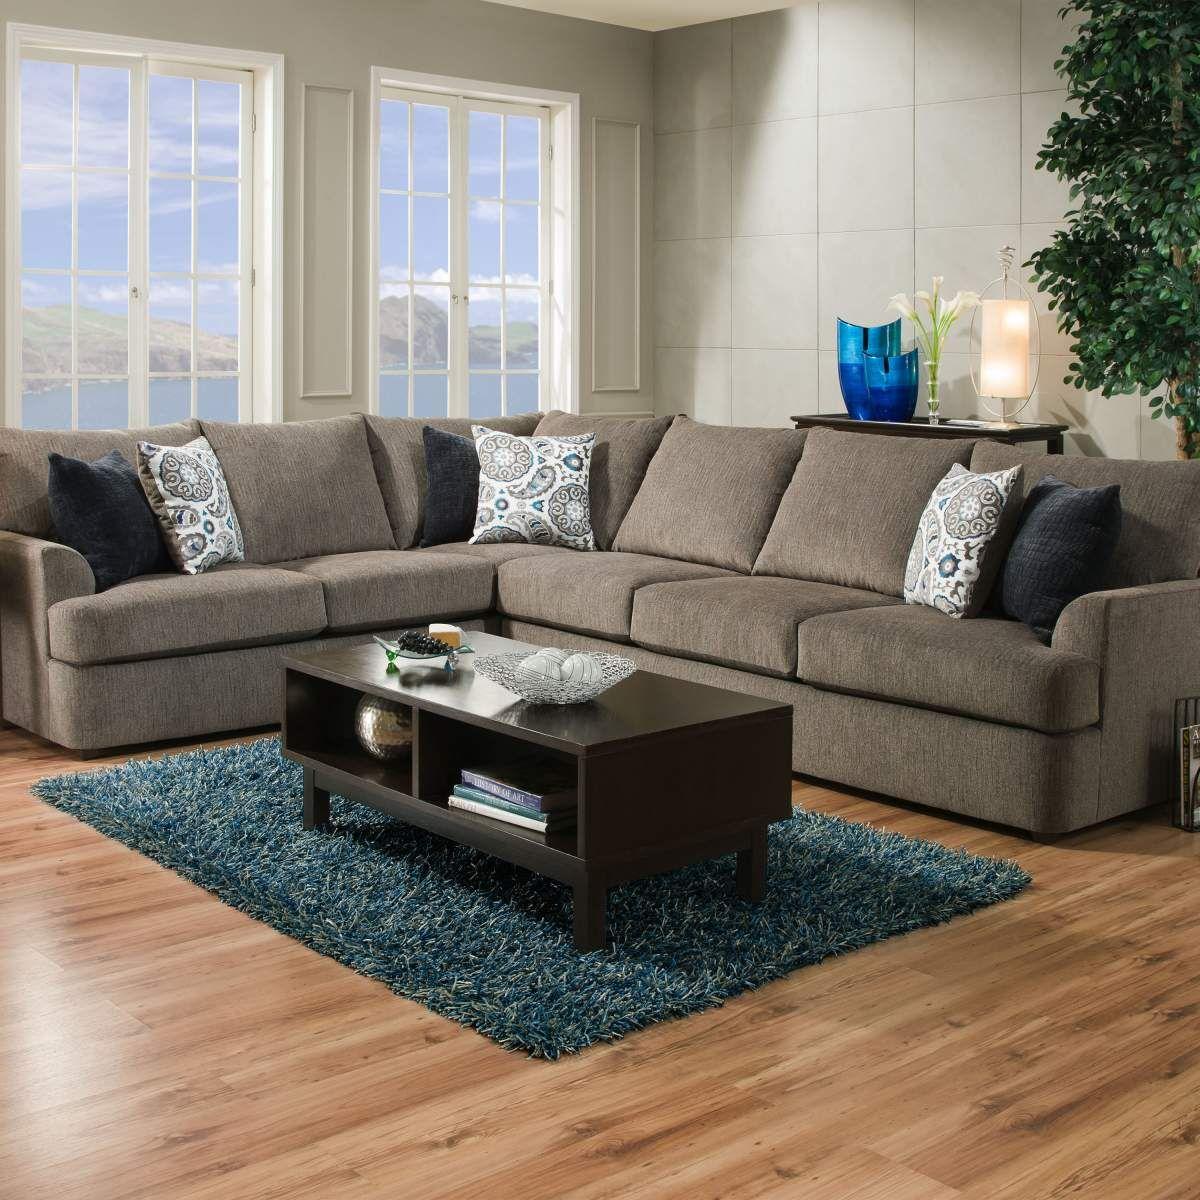 Furniture Mattress Columbus Ohio Craigslist Fort Benning Ga